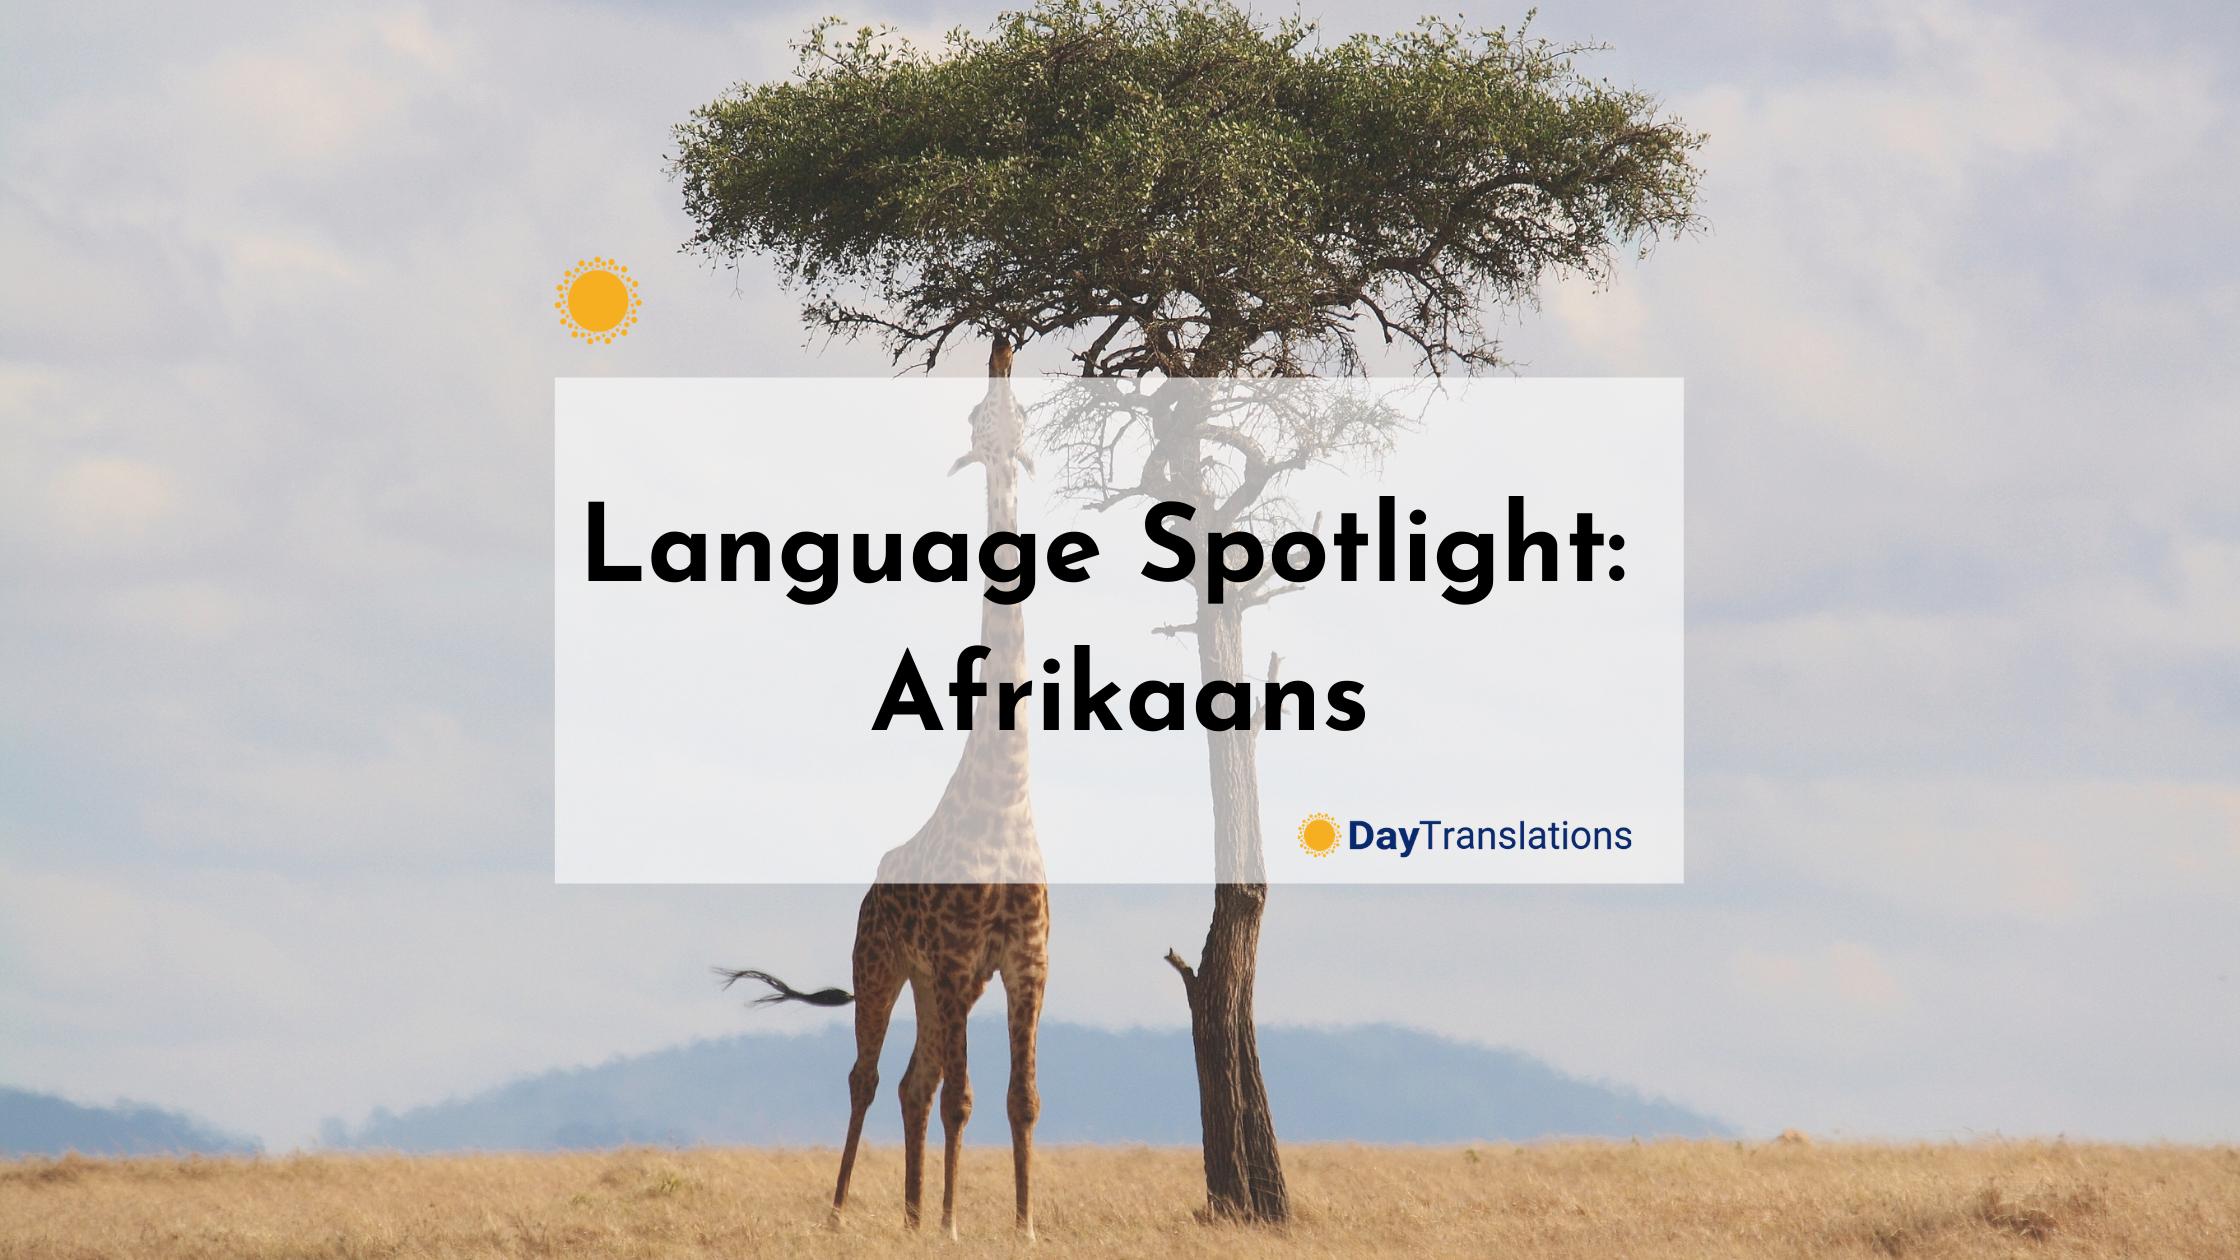 Language Spotlight: Afrikaans